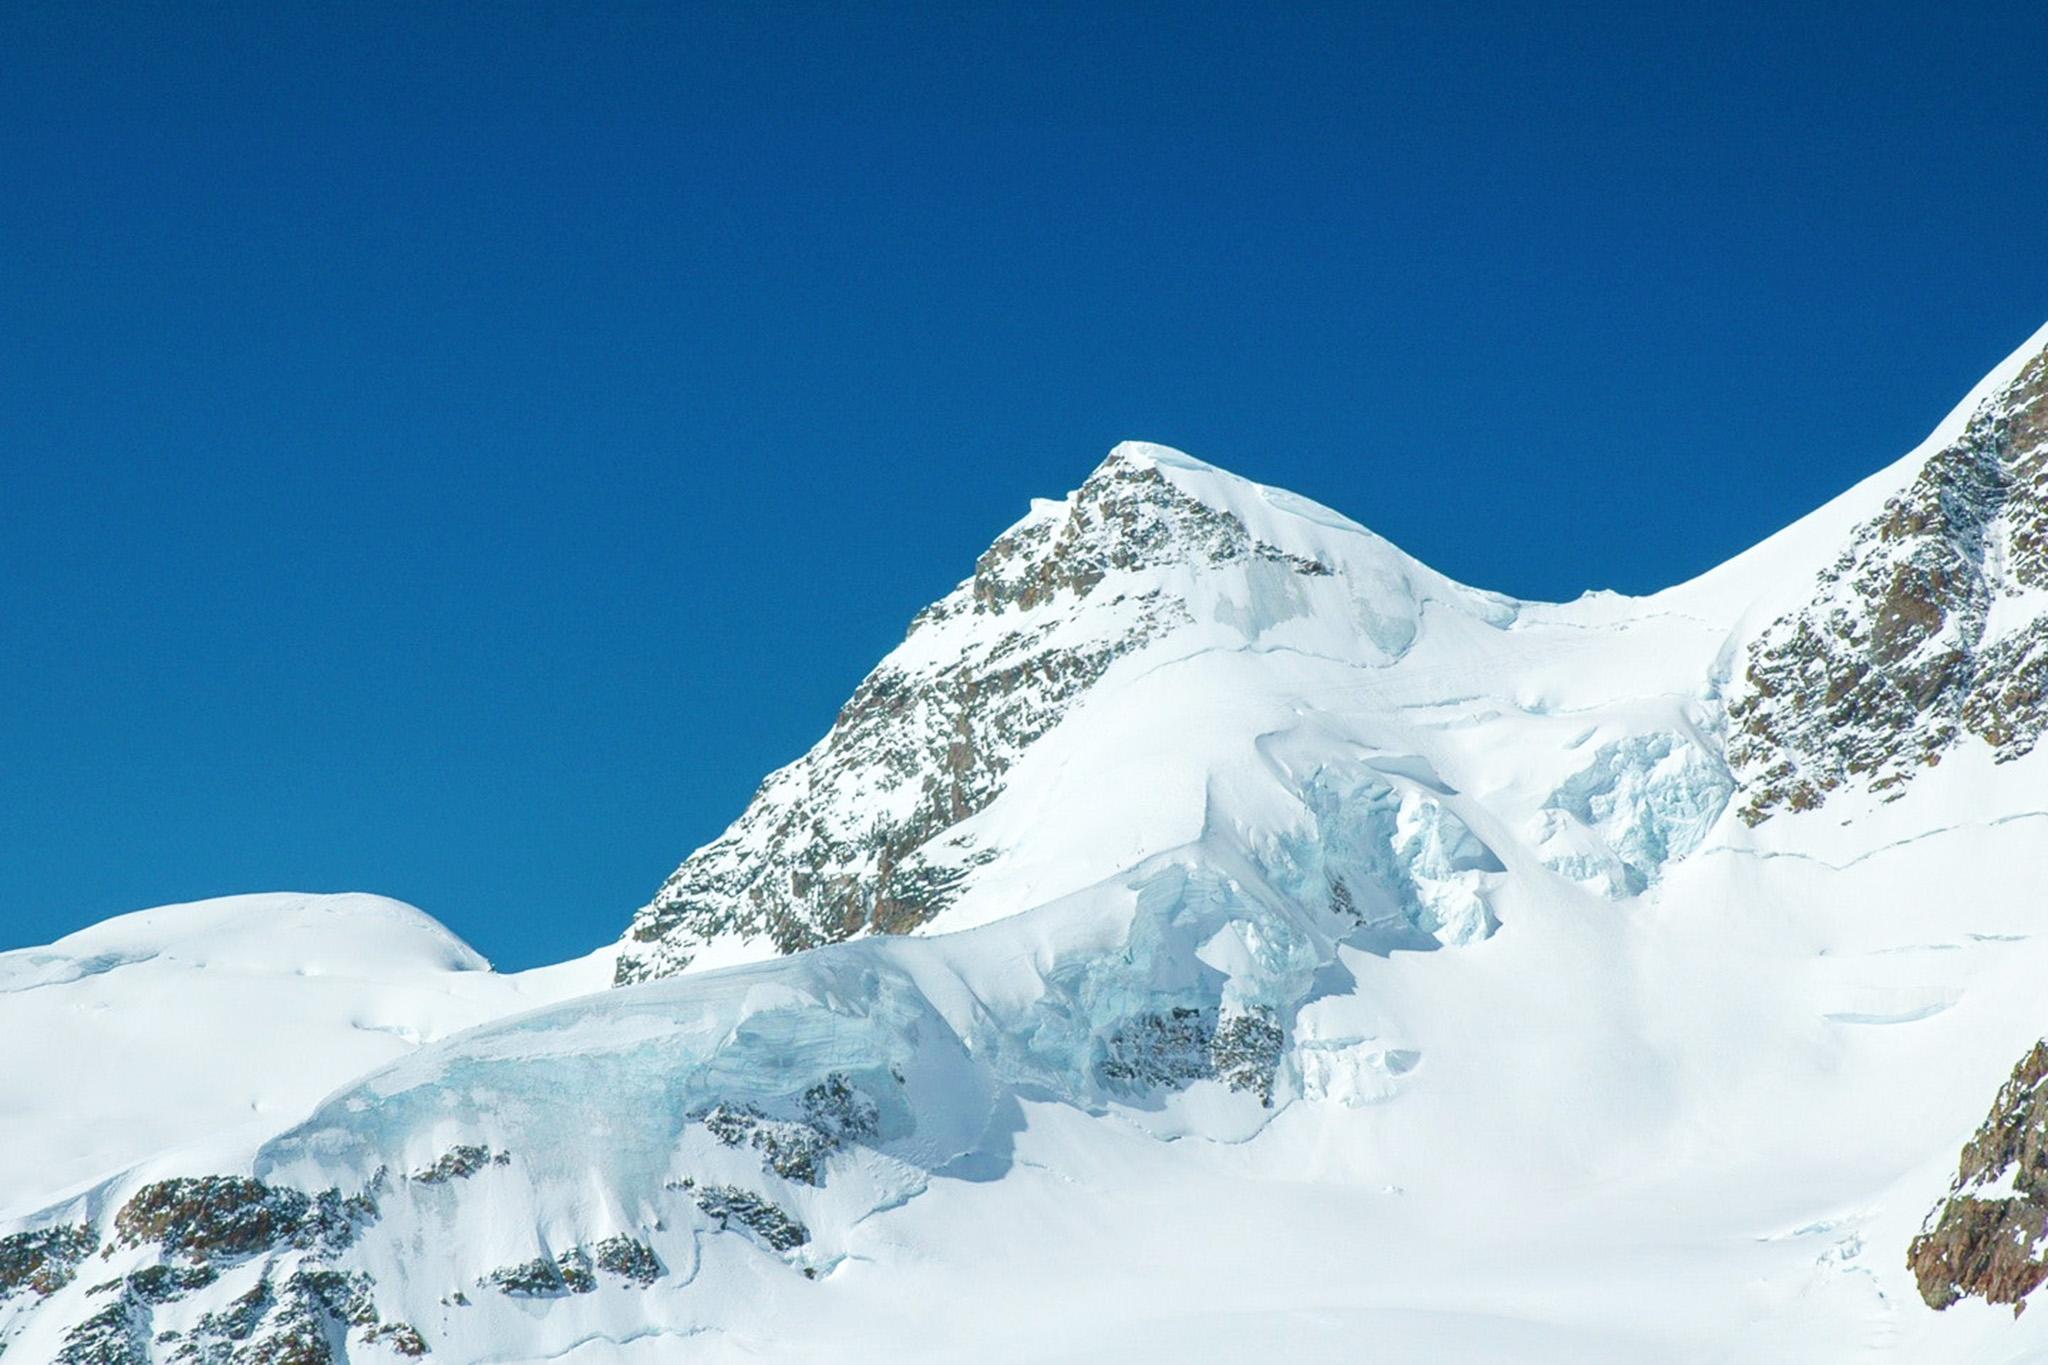 kt_2020_360_Keytours_excursions_Swisstours_interlaken_jungfraujoch2_2048_10